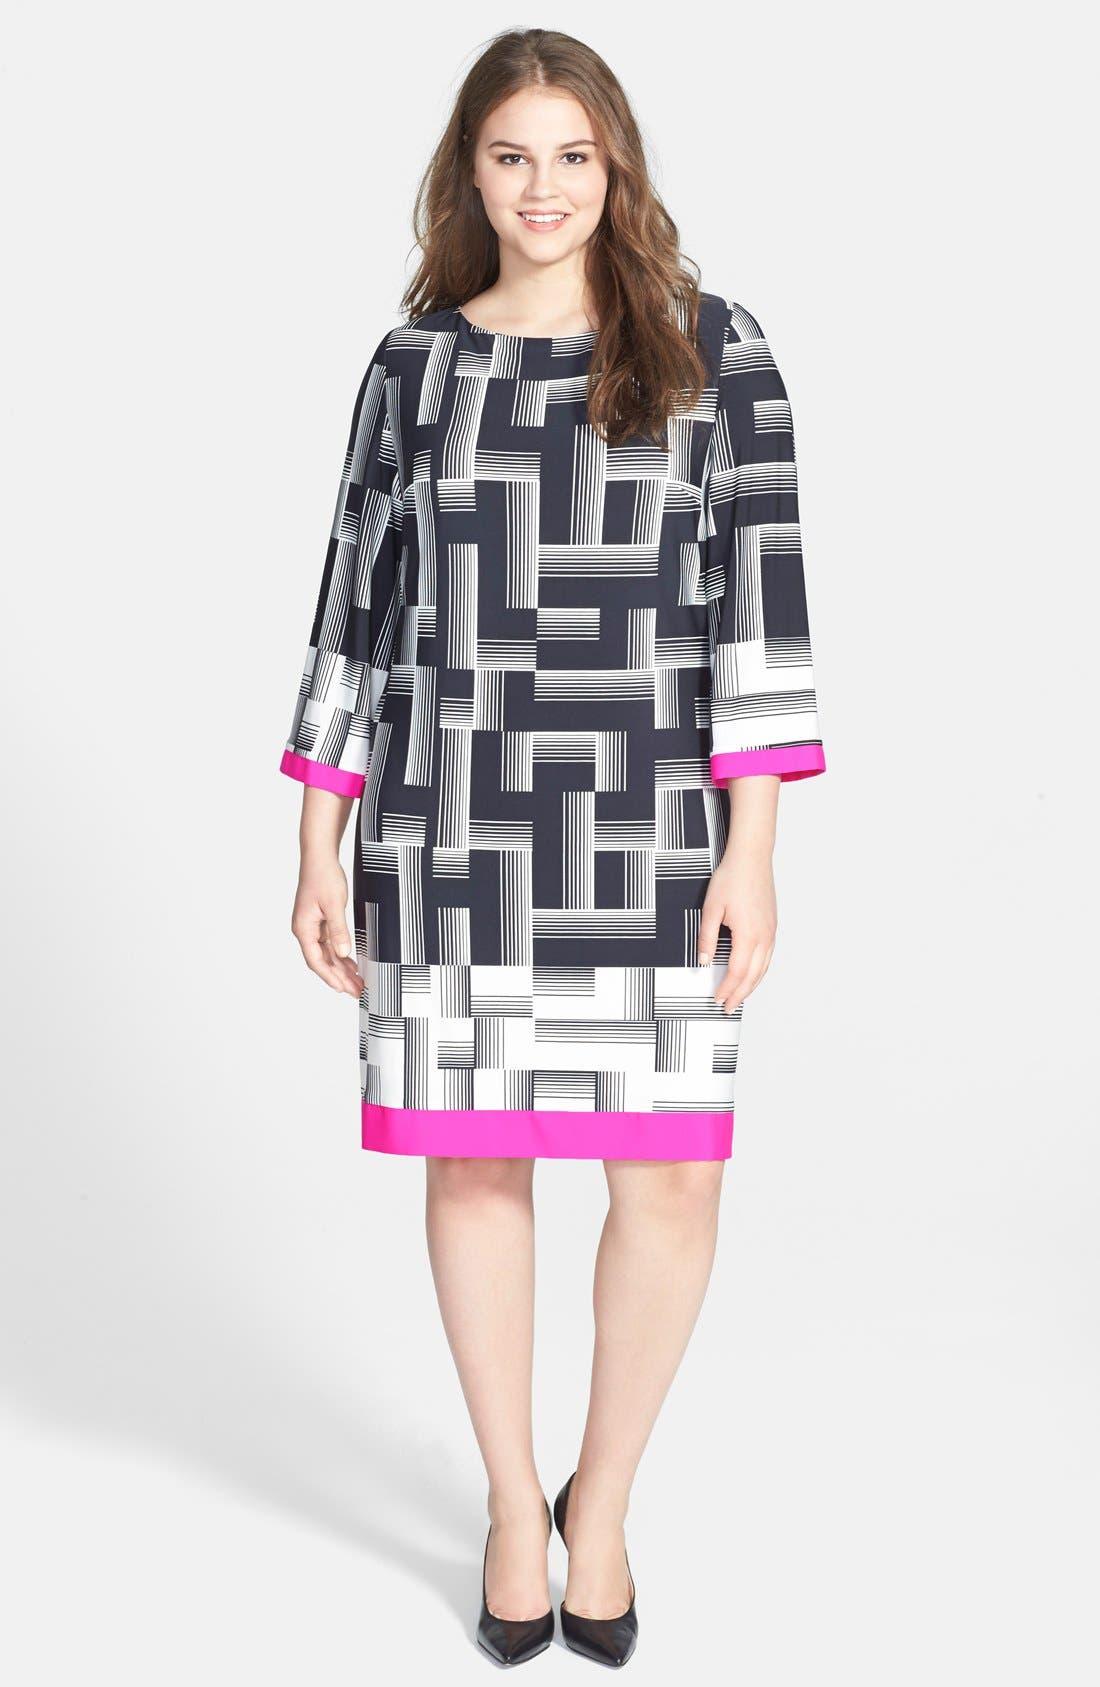 Alternate Image 1 Selected - Eliza J Print Woven Trim Sheath Dress (Plus Size) (Online Only)